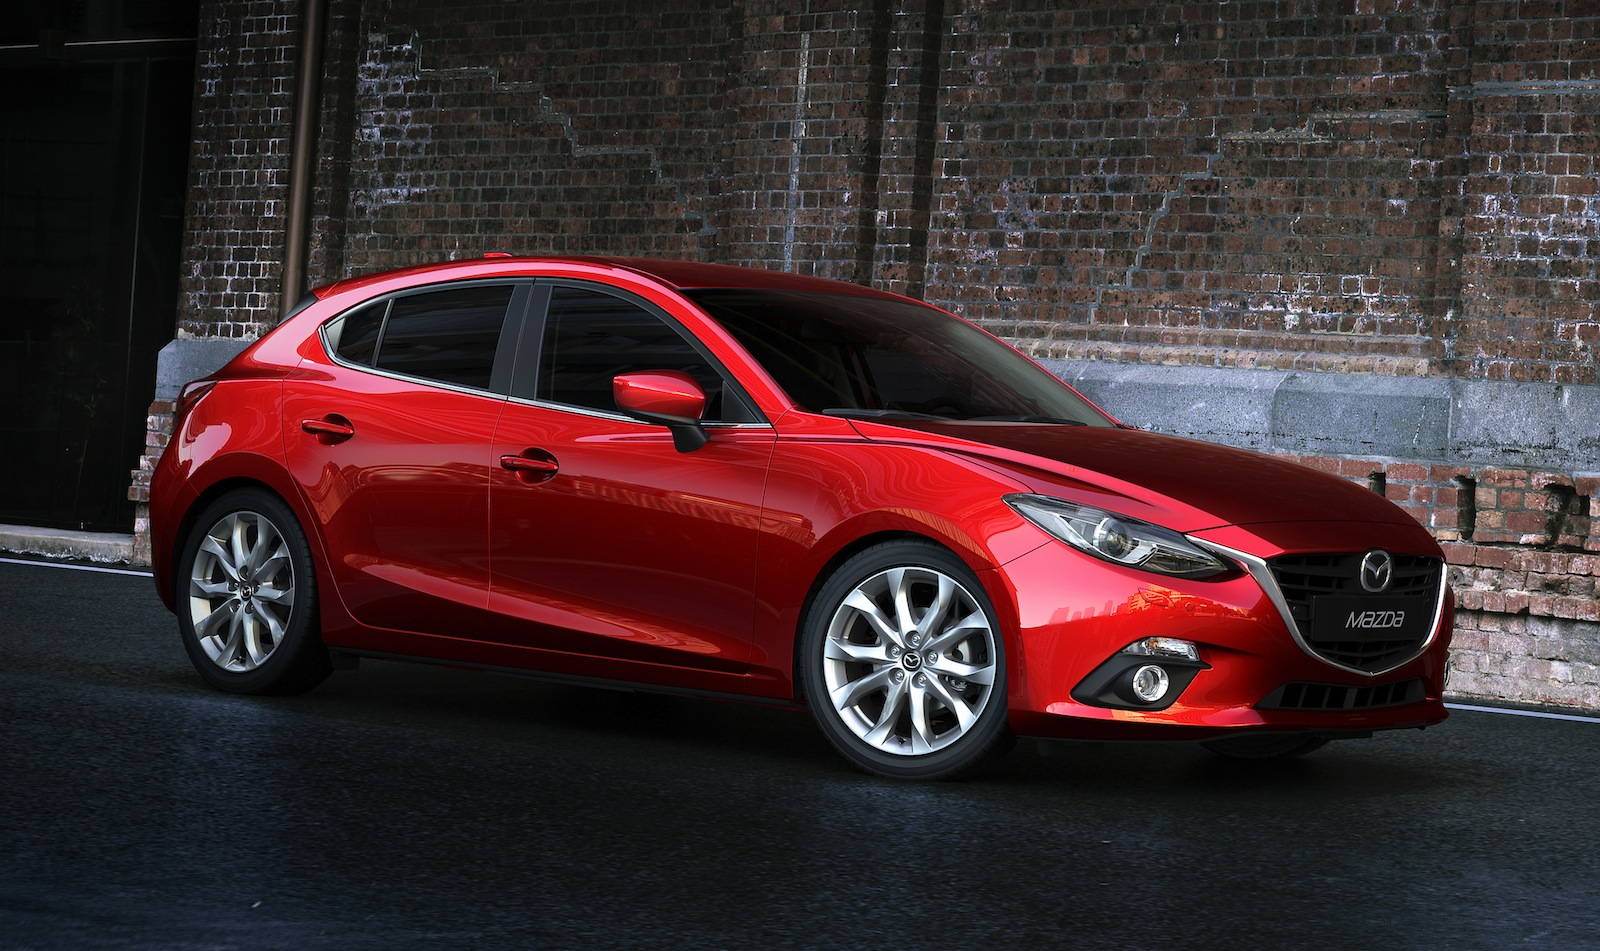 Mazda-3-hatch-7.jpg